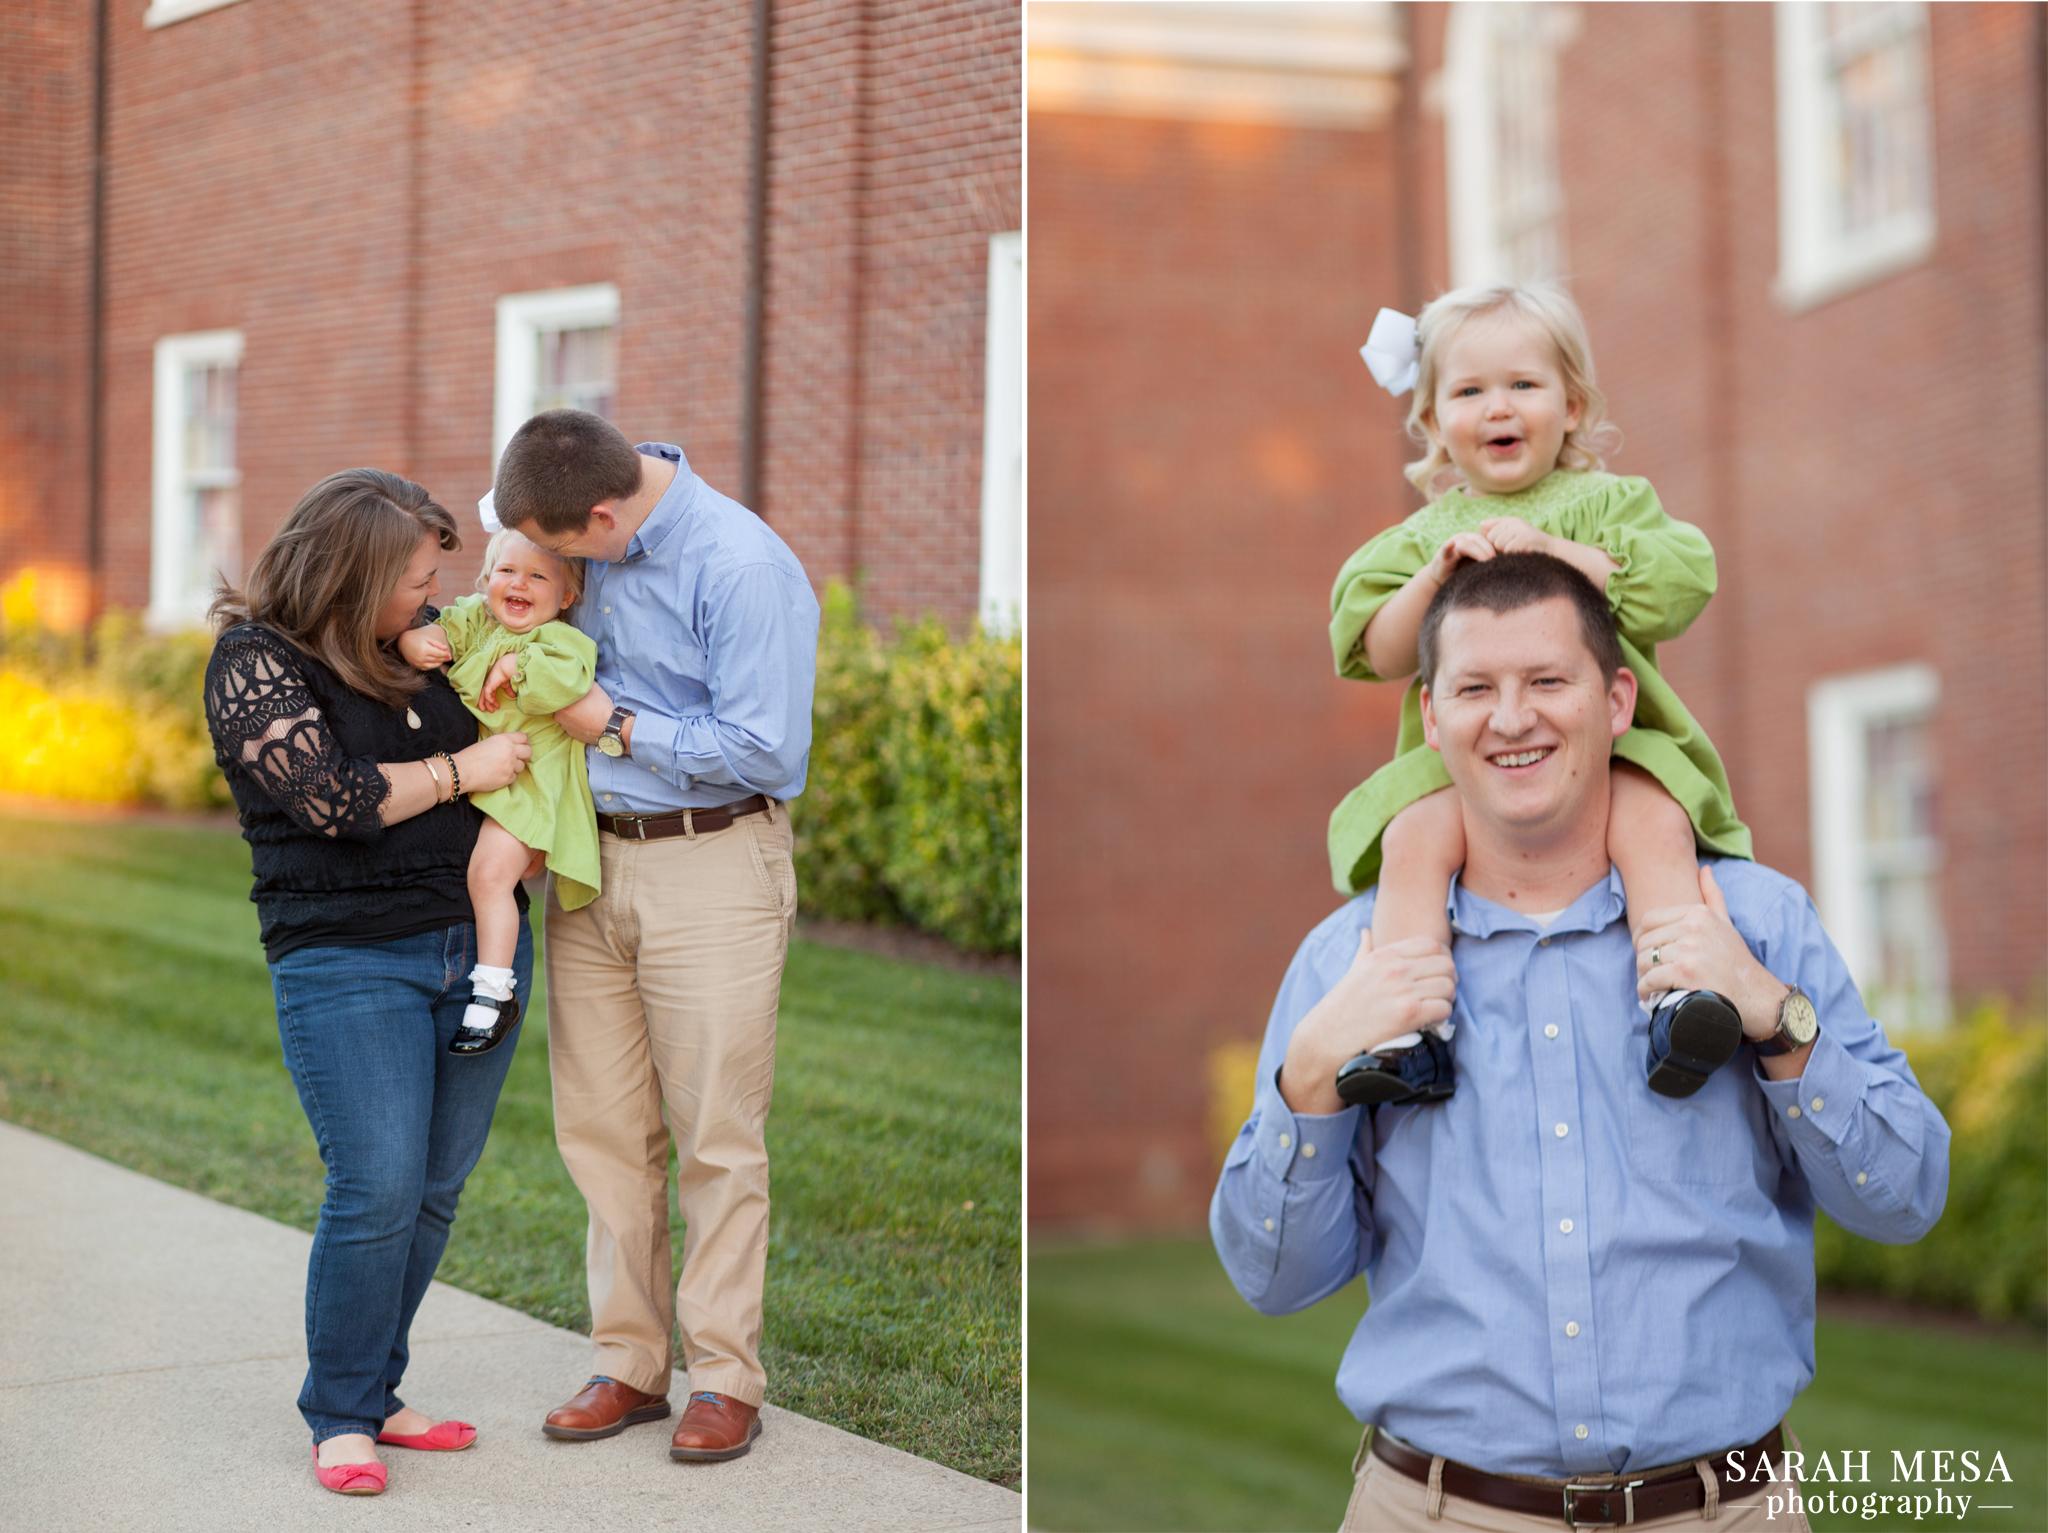 Sarah Mesa Photography   Louisville Wedding and Portrait Photographer